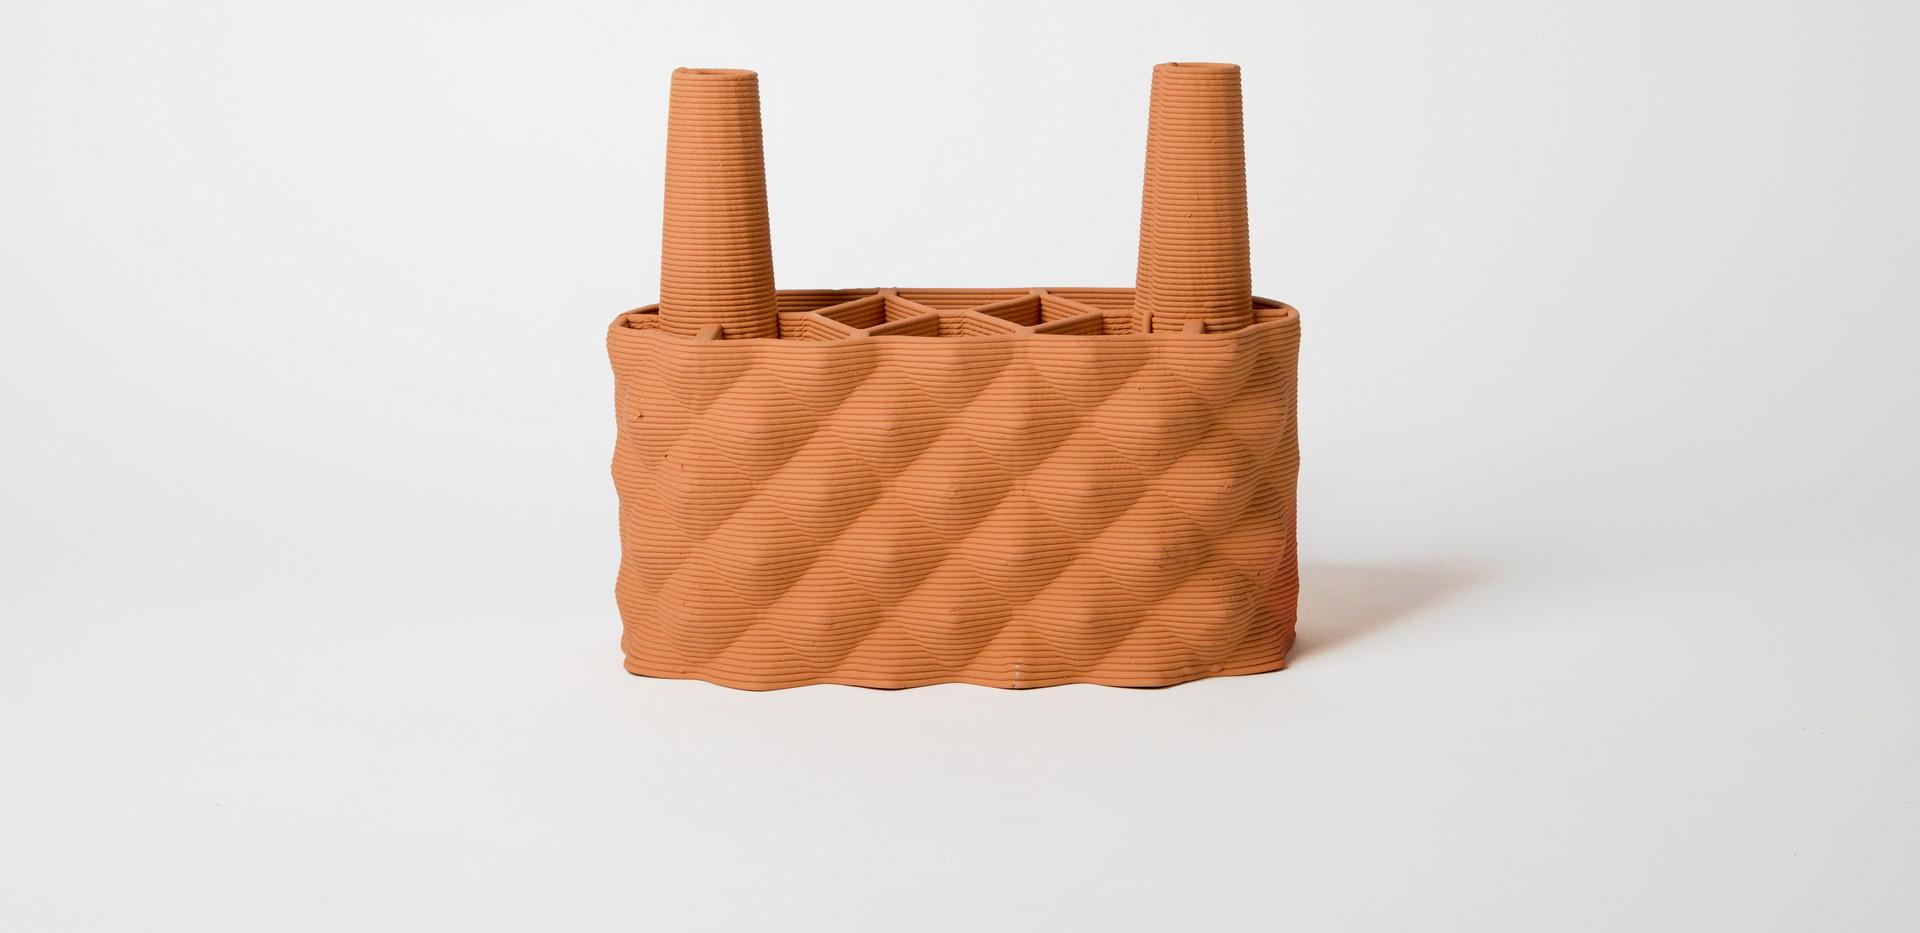 Brick_Marie_Griesmar_BeneathTheSea_41.jp